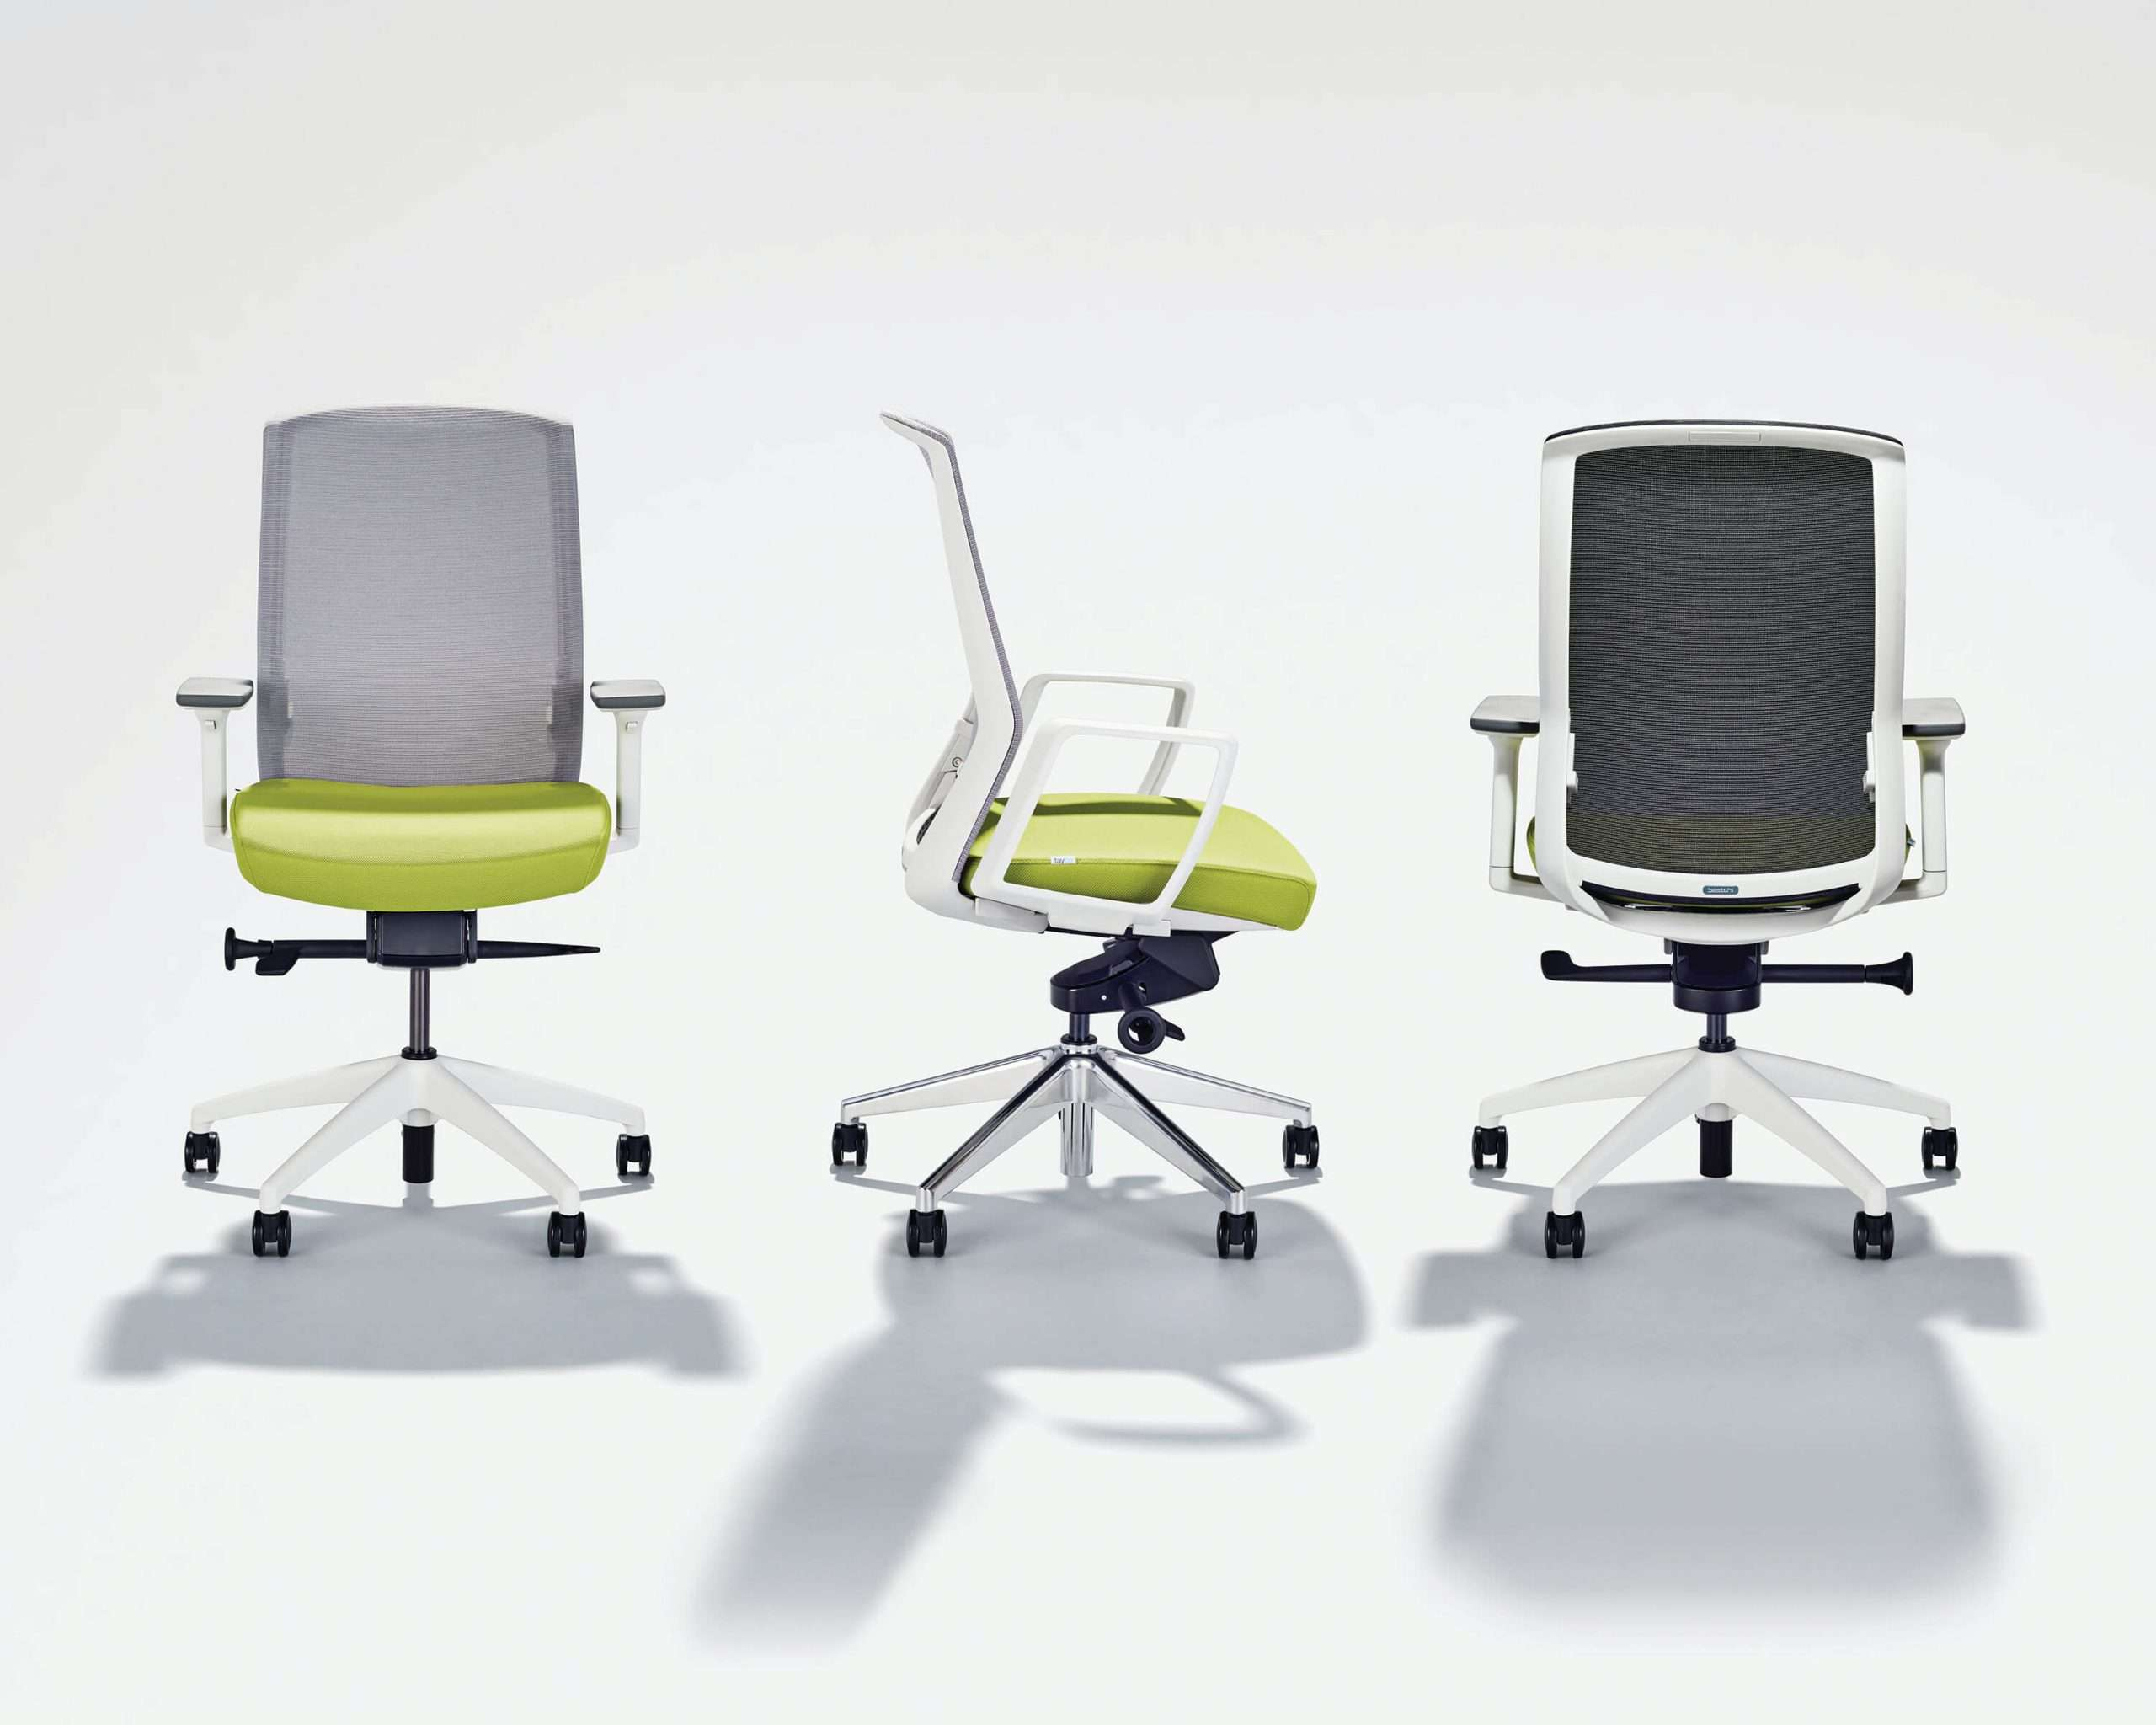 Tayco seating